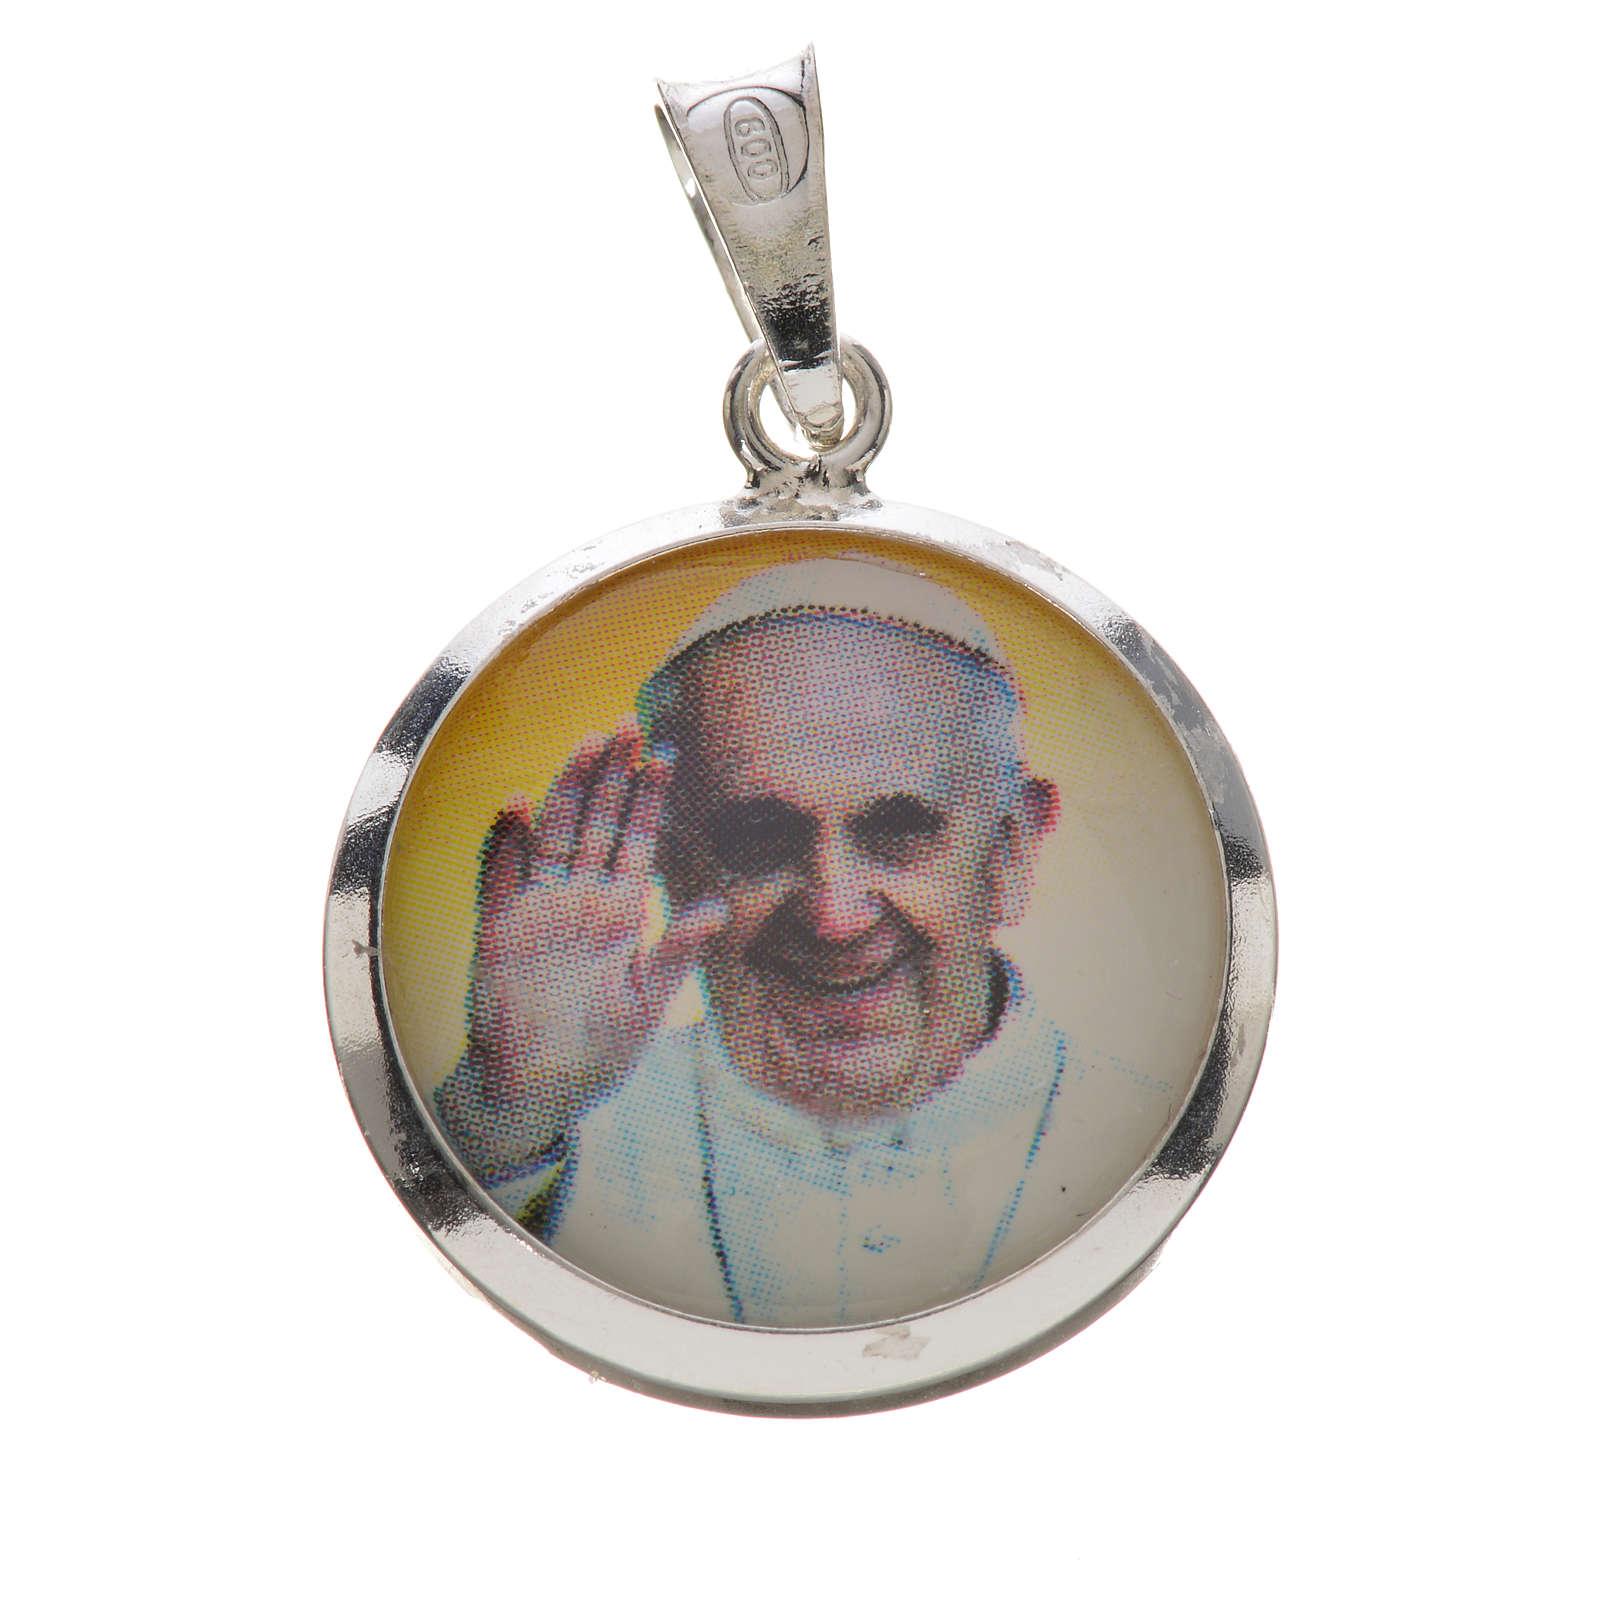 Pendente medaglia immagine Papa Francesco argento 800 4